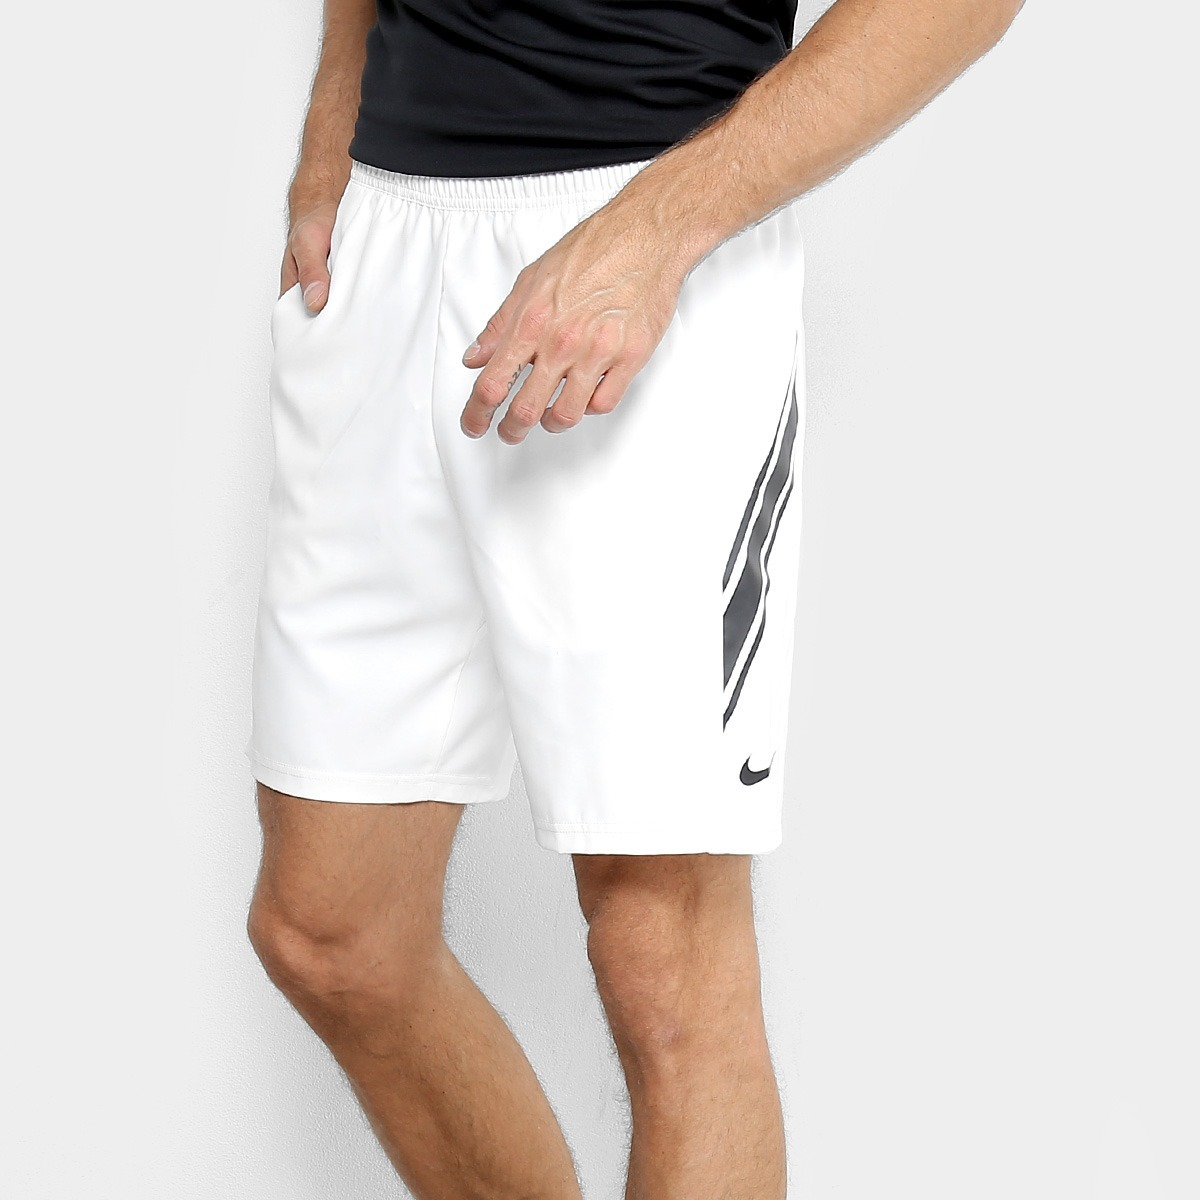 742cb1d740 bermuda nike shorts dry 9in masculina branco original+nf. Carregando zoom.